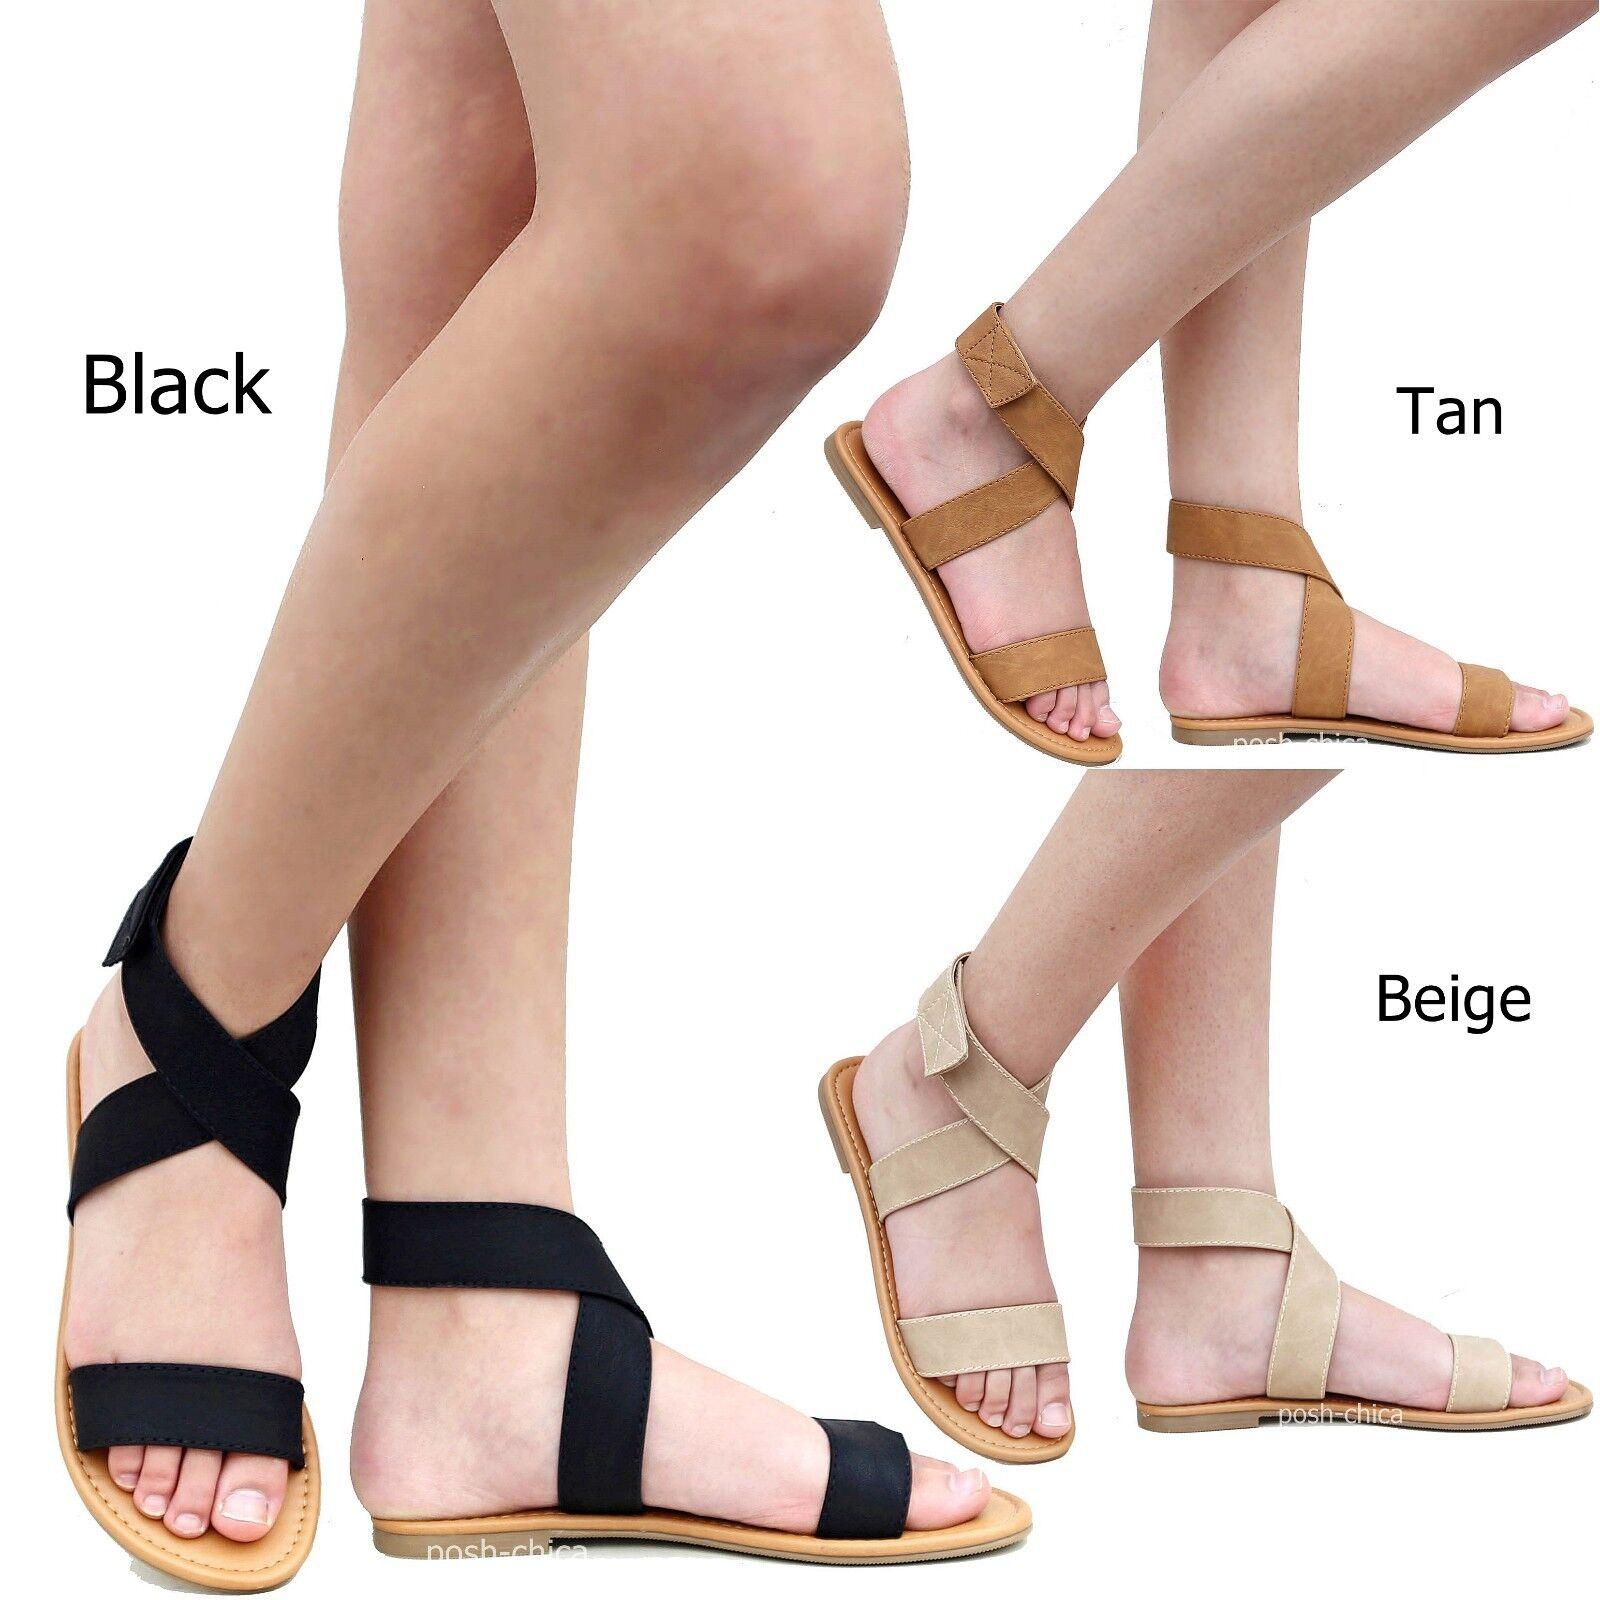 New Women CFld Wrap Black Pink Tan Beige Gladiator Ankle Wrap CFld Flat Sandals e4344b